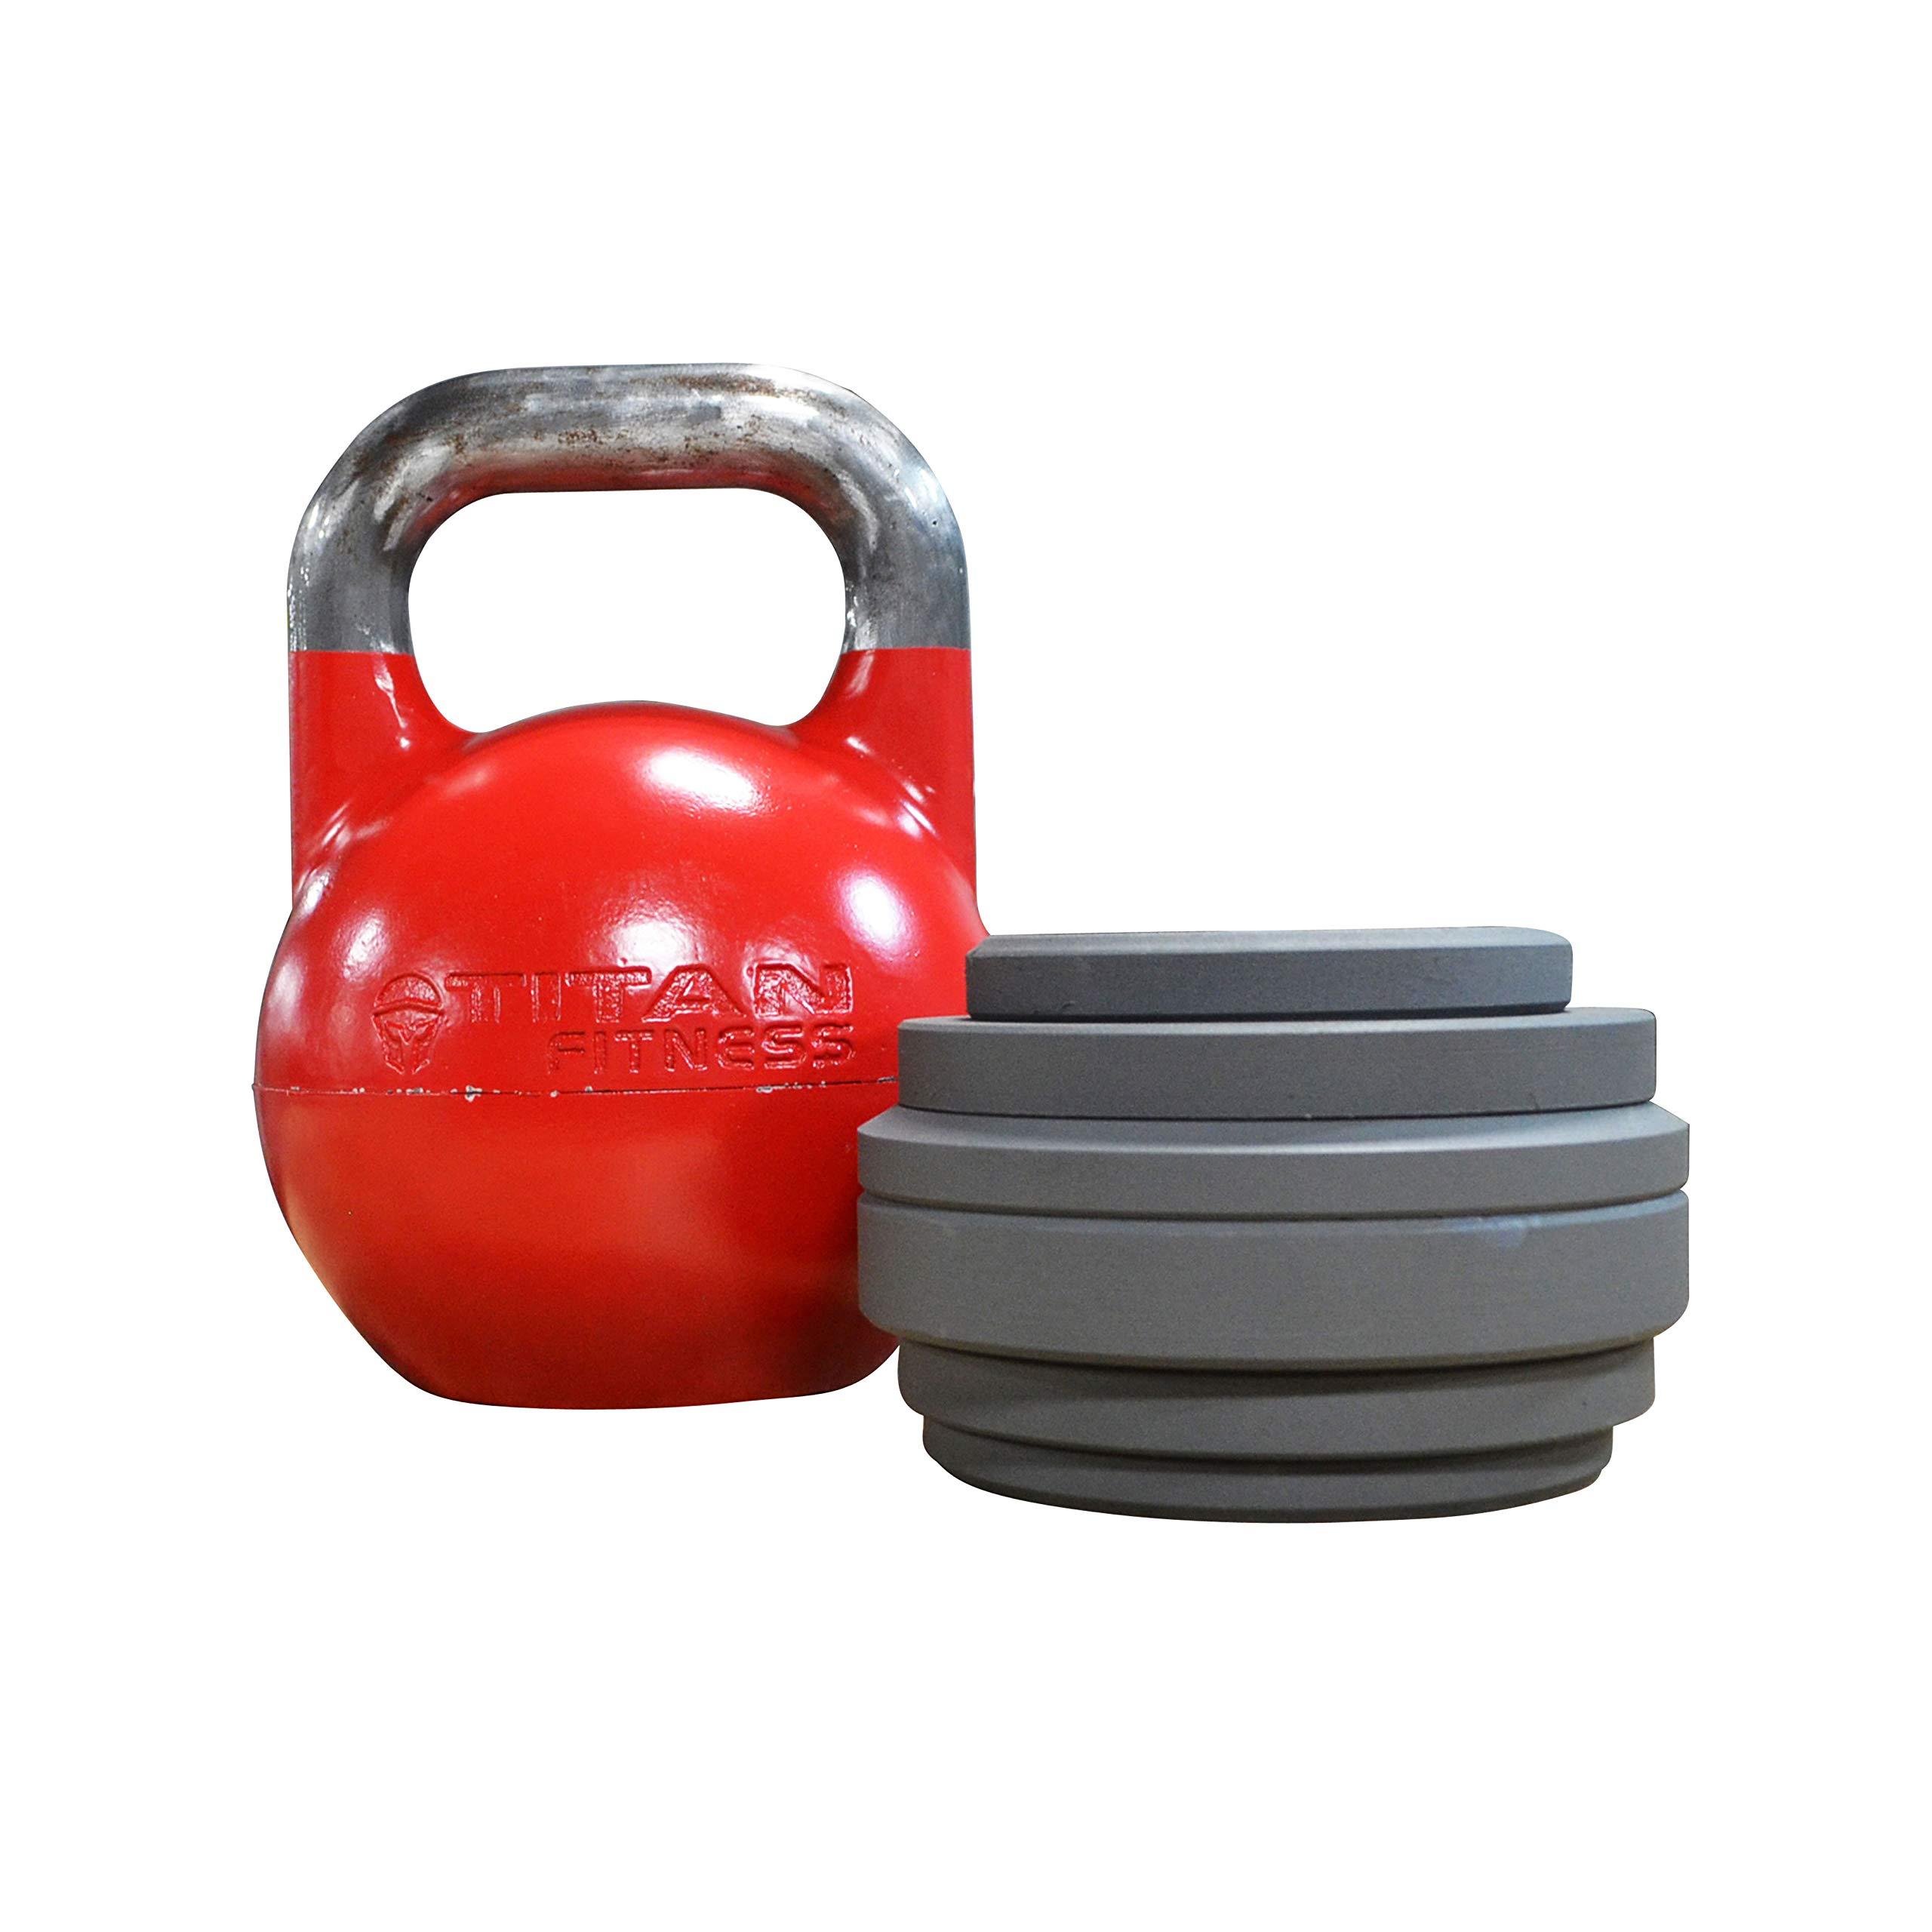 Titan Adjustable Competition Style Kettlebell   12 KG - 32 KG